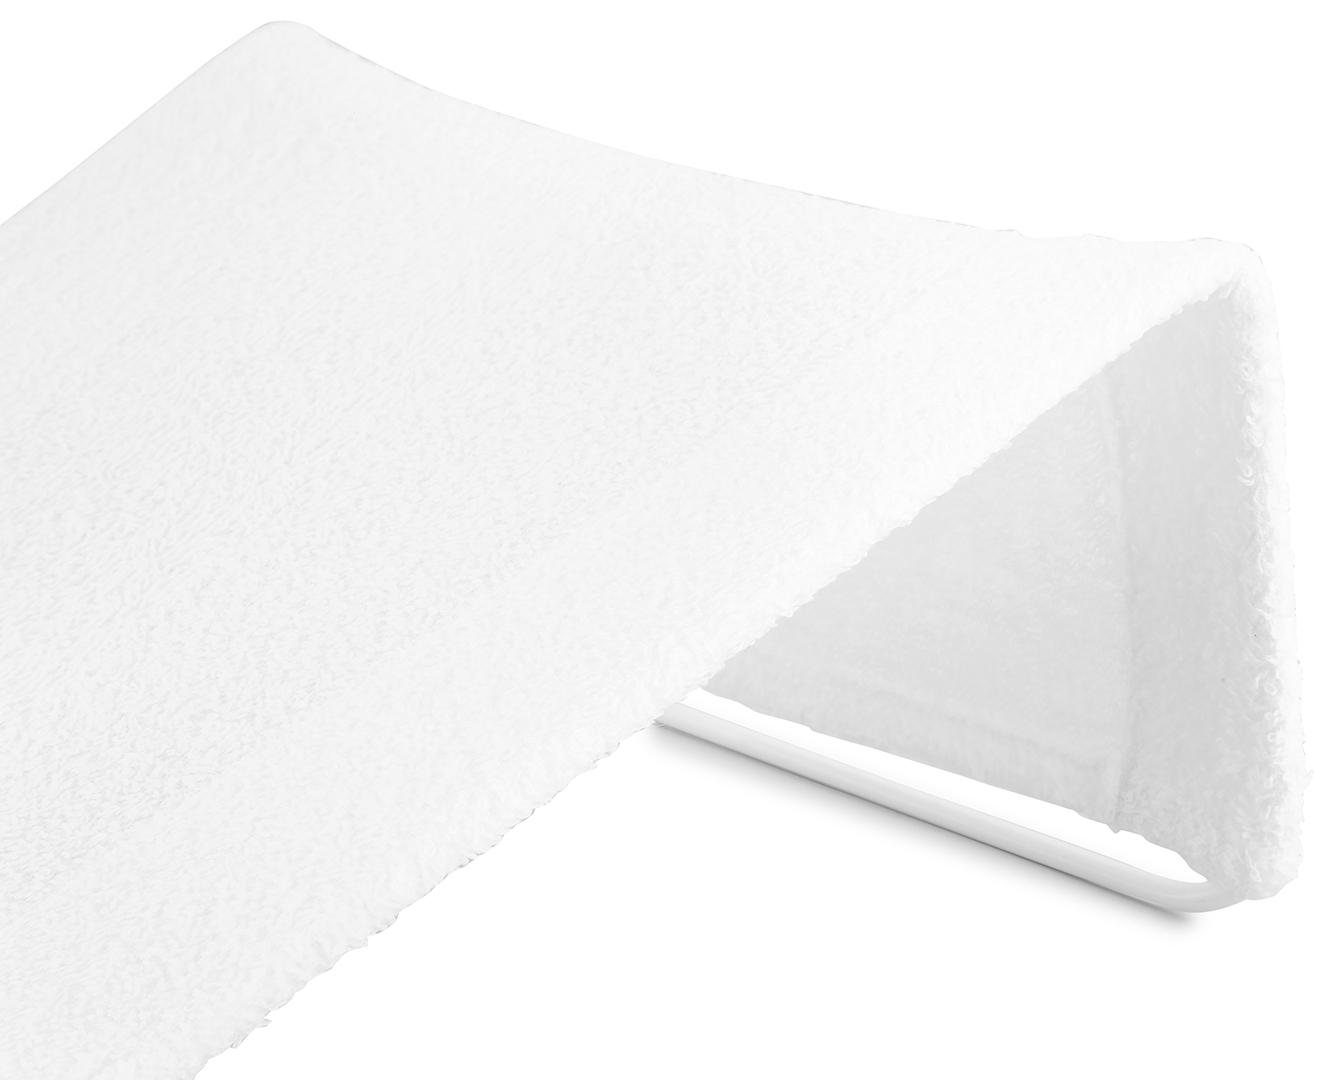 Baby Bath Aid - White 9342932000019 | eBay